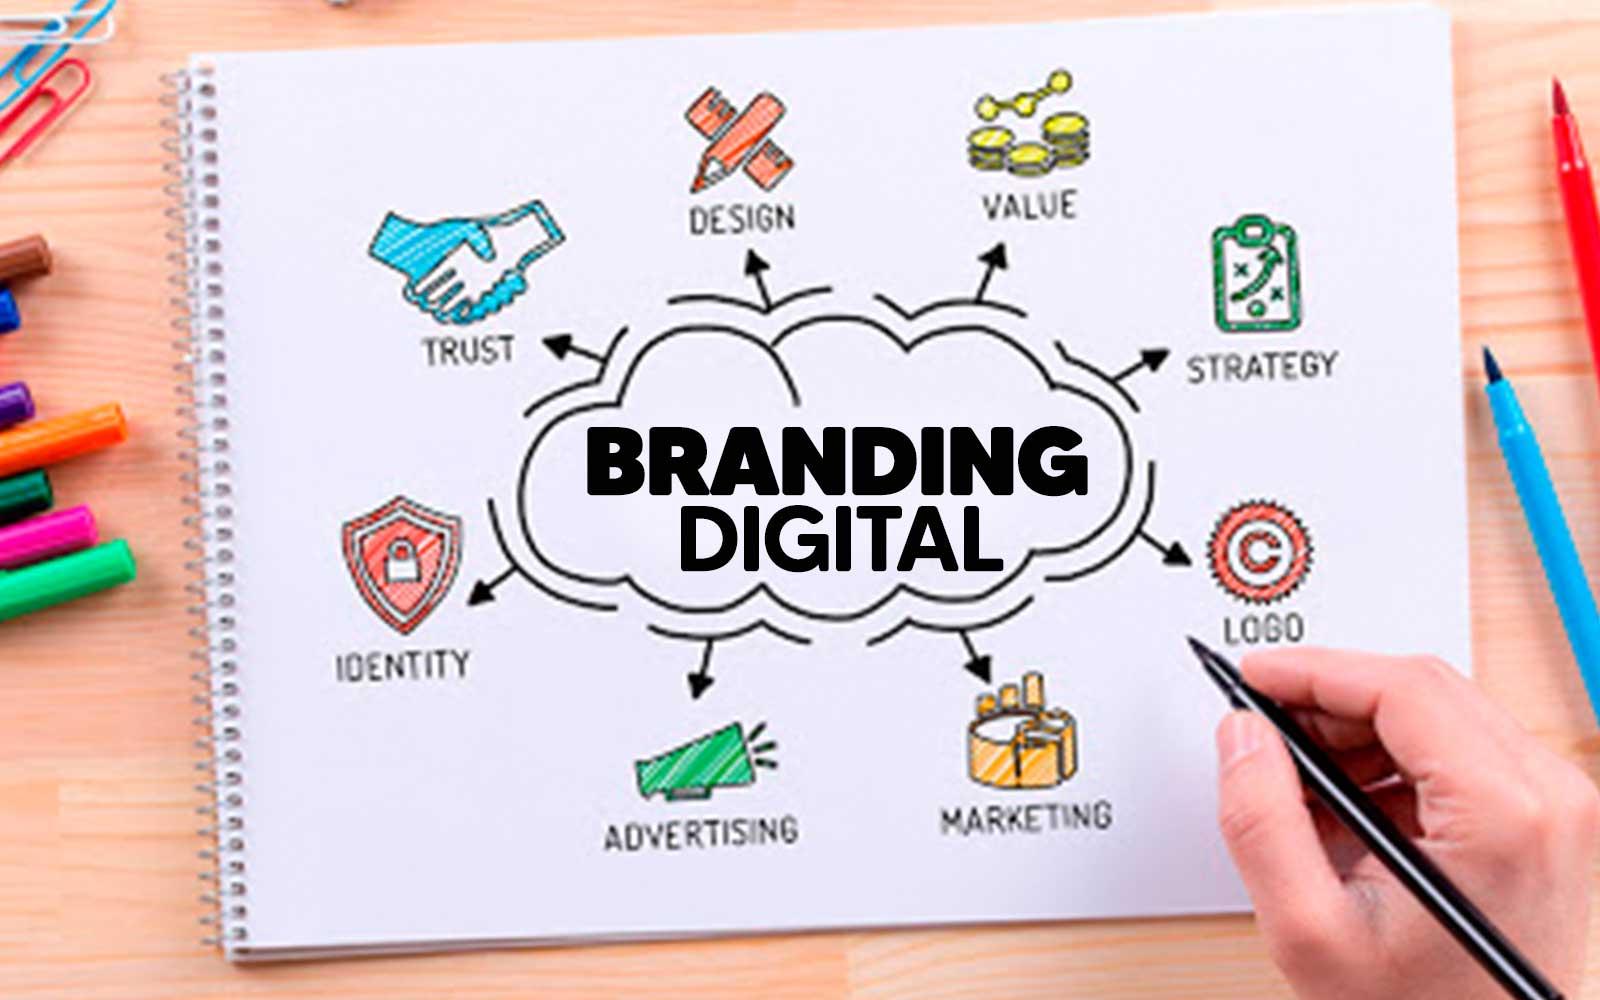 Brandign Digital